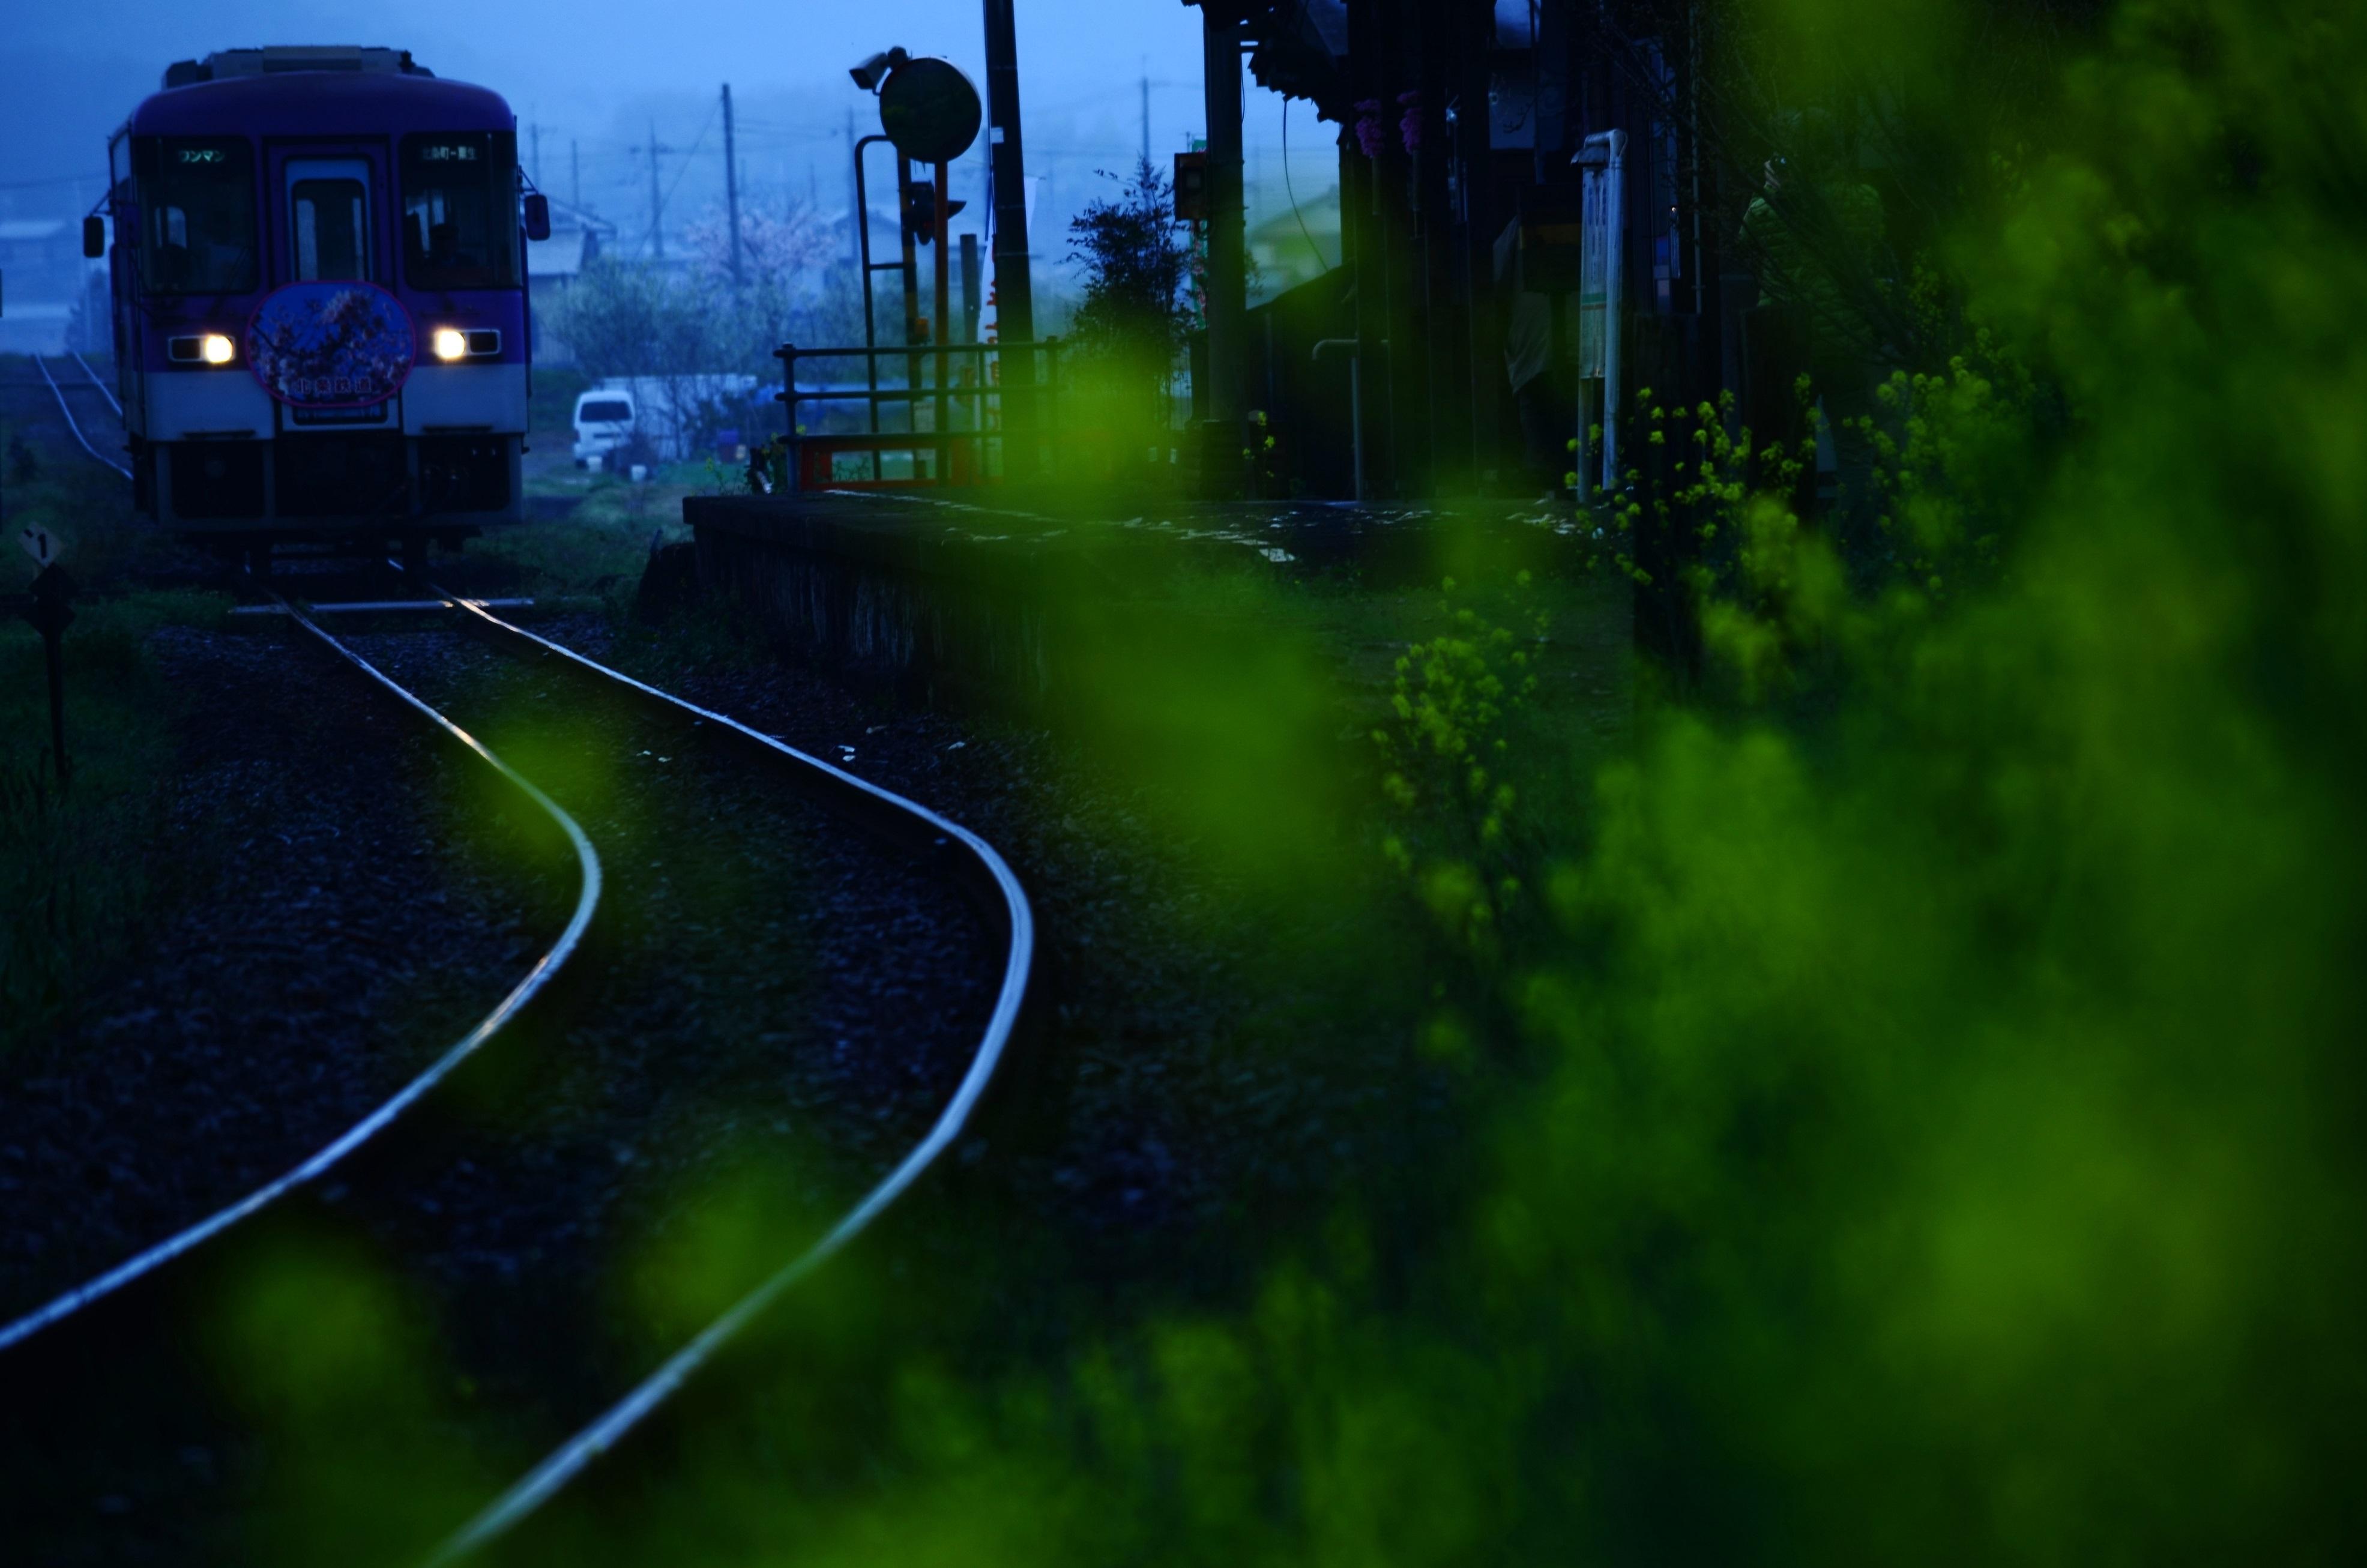 DSC_7454.jpg